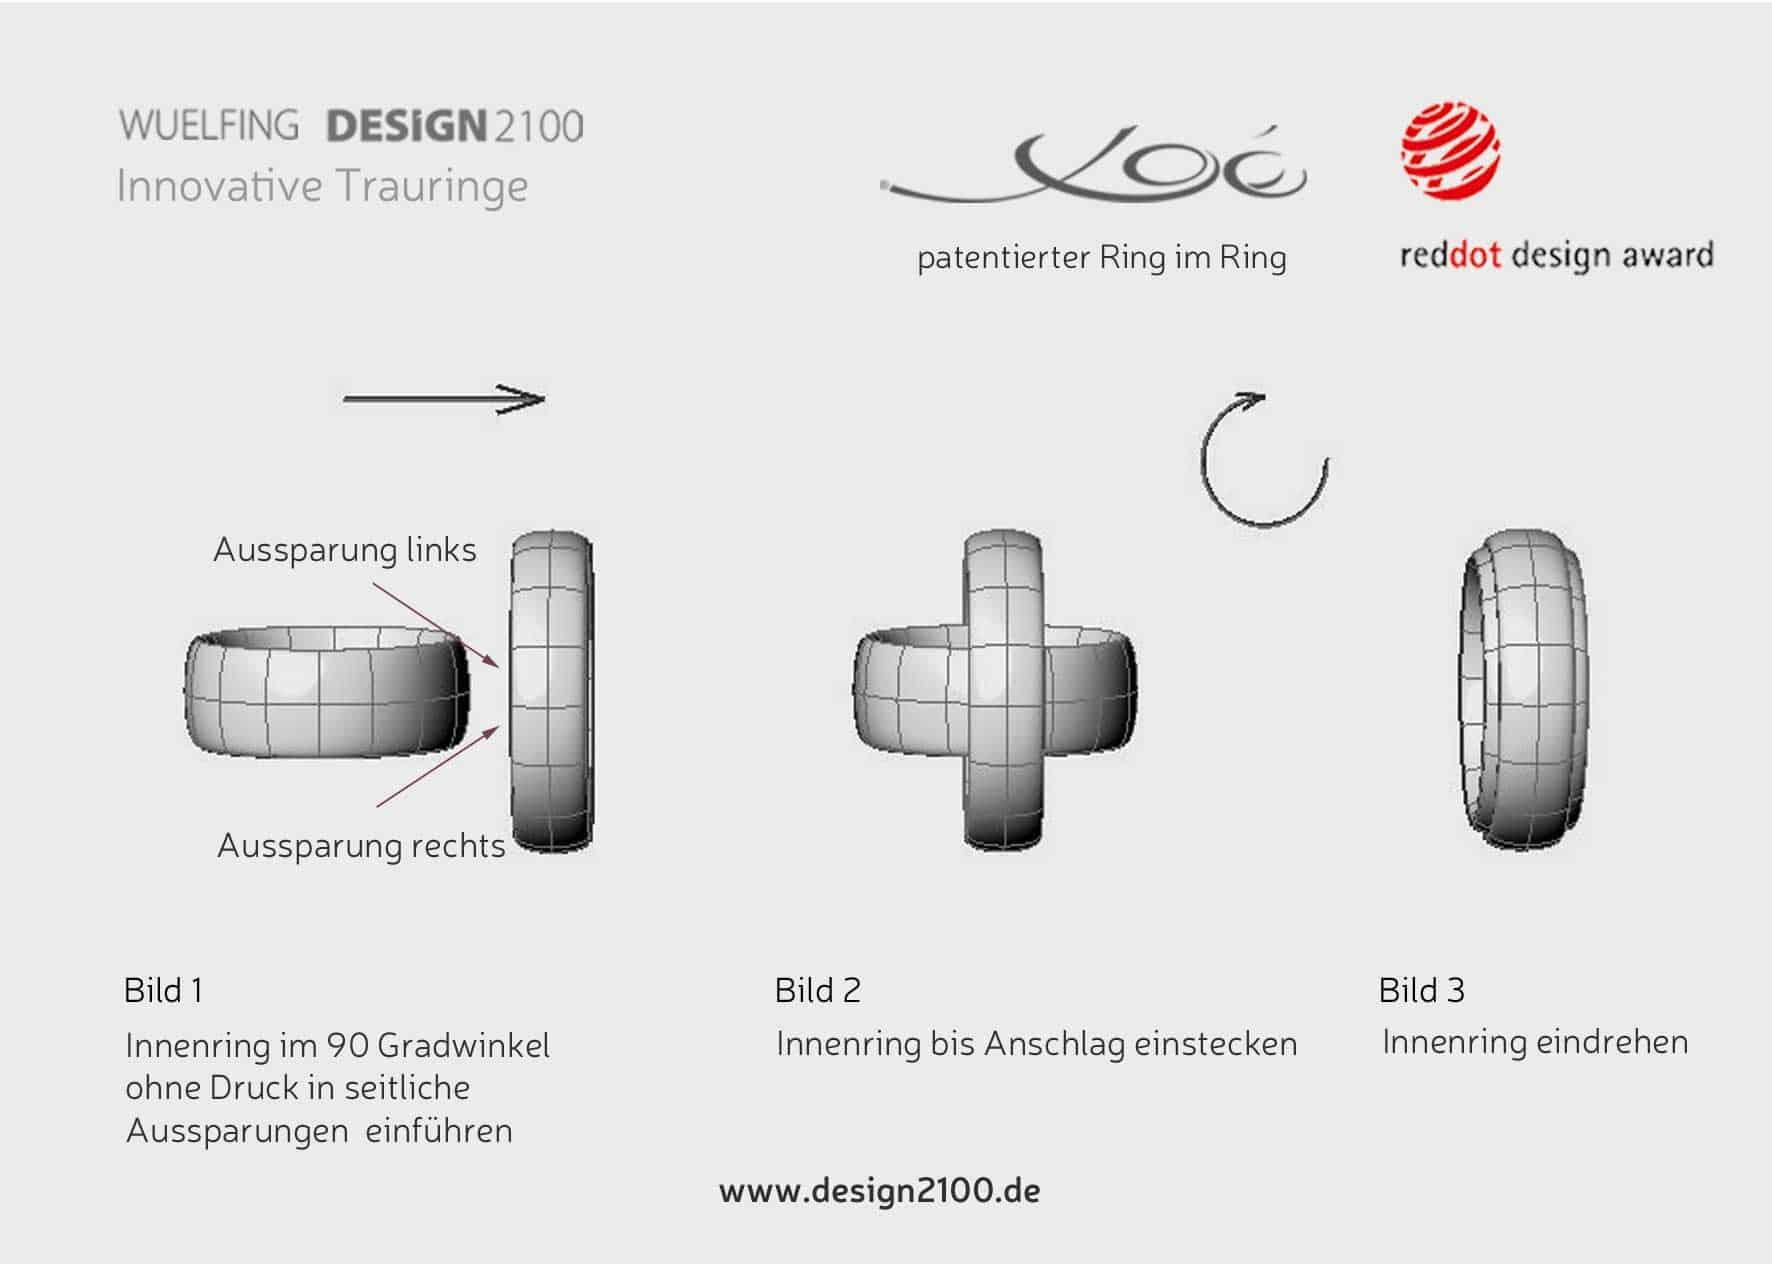 Montageanleitung vom Ring im Ring Partnerring